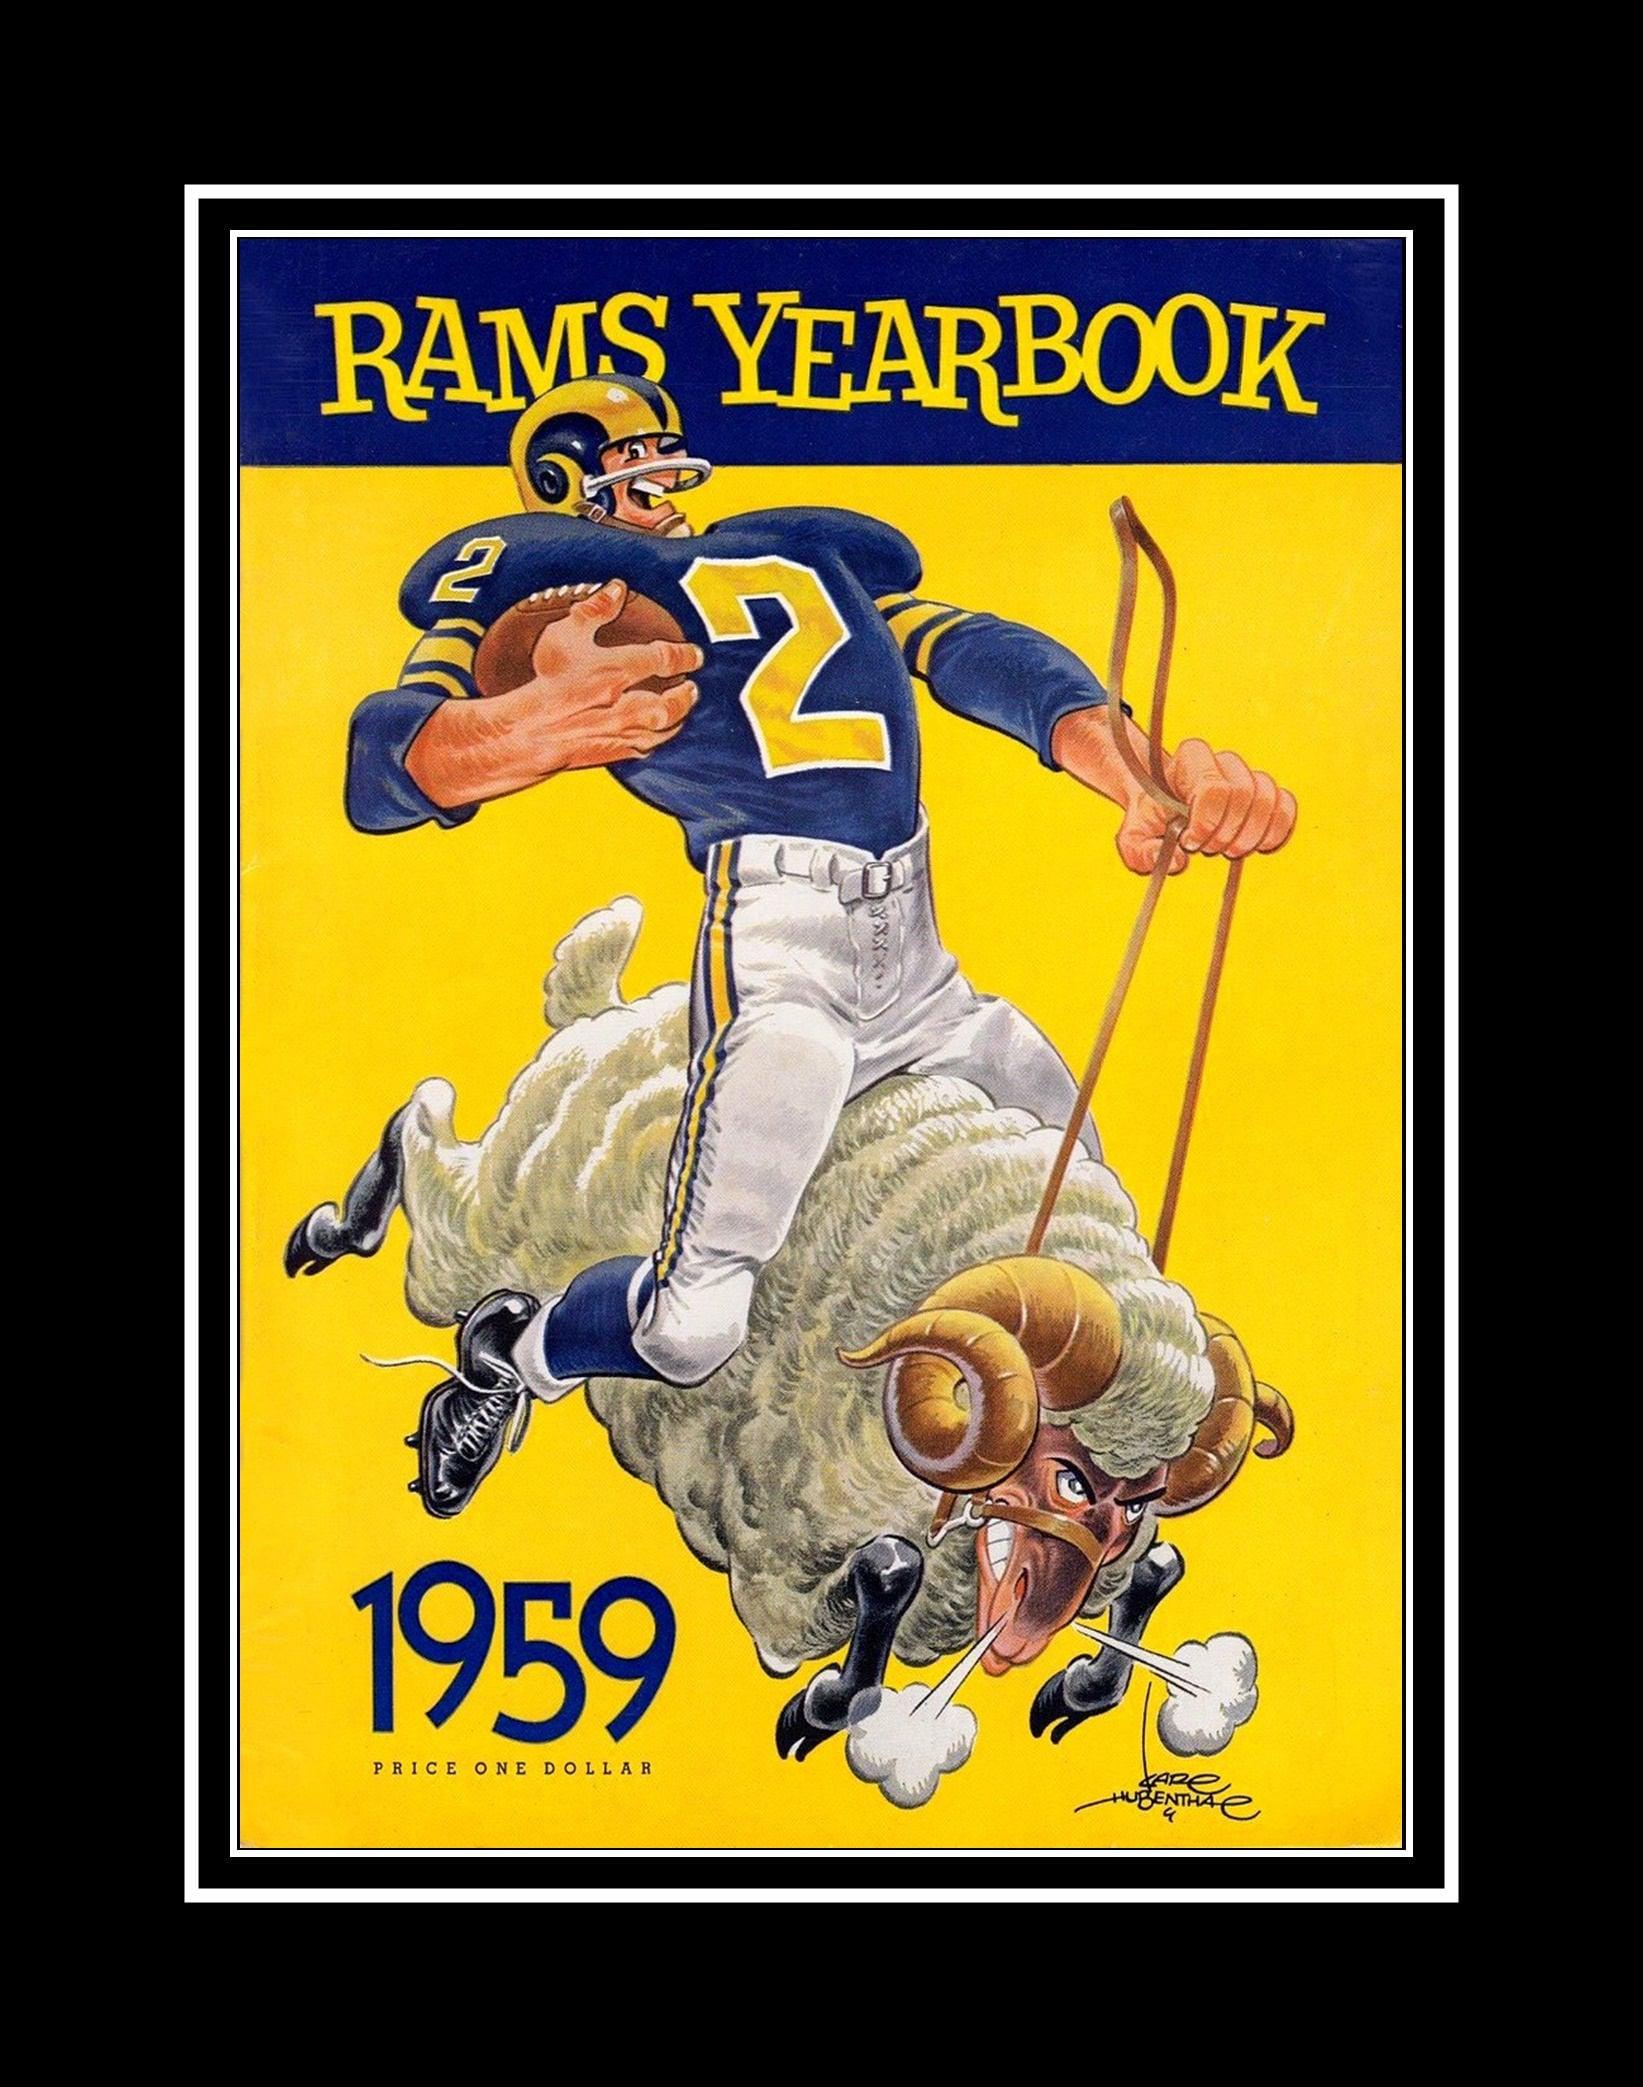 LA Rams 1959 Yearbook Cover Art Poster NFL Football Fan Wall